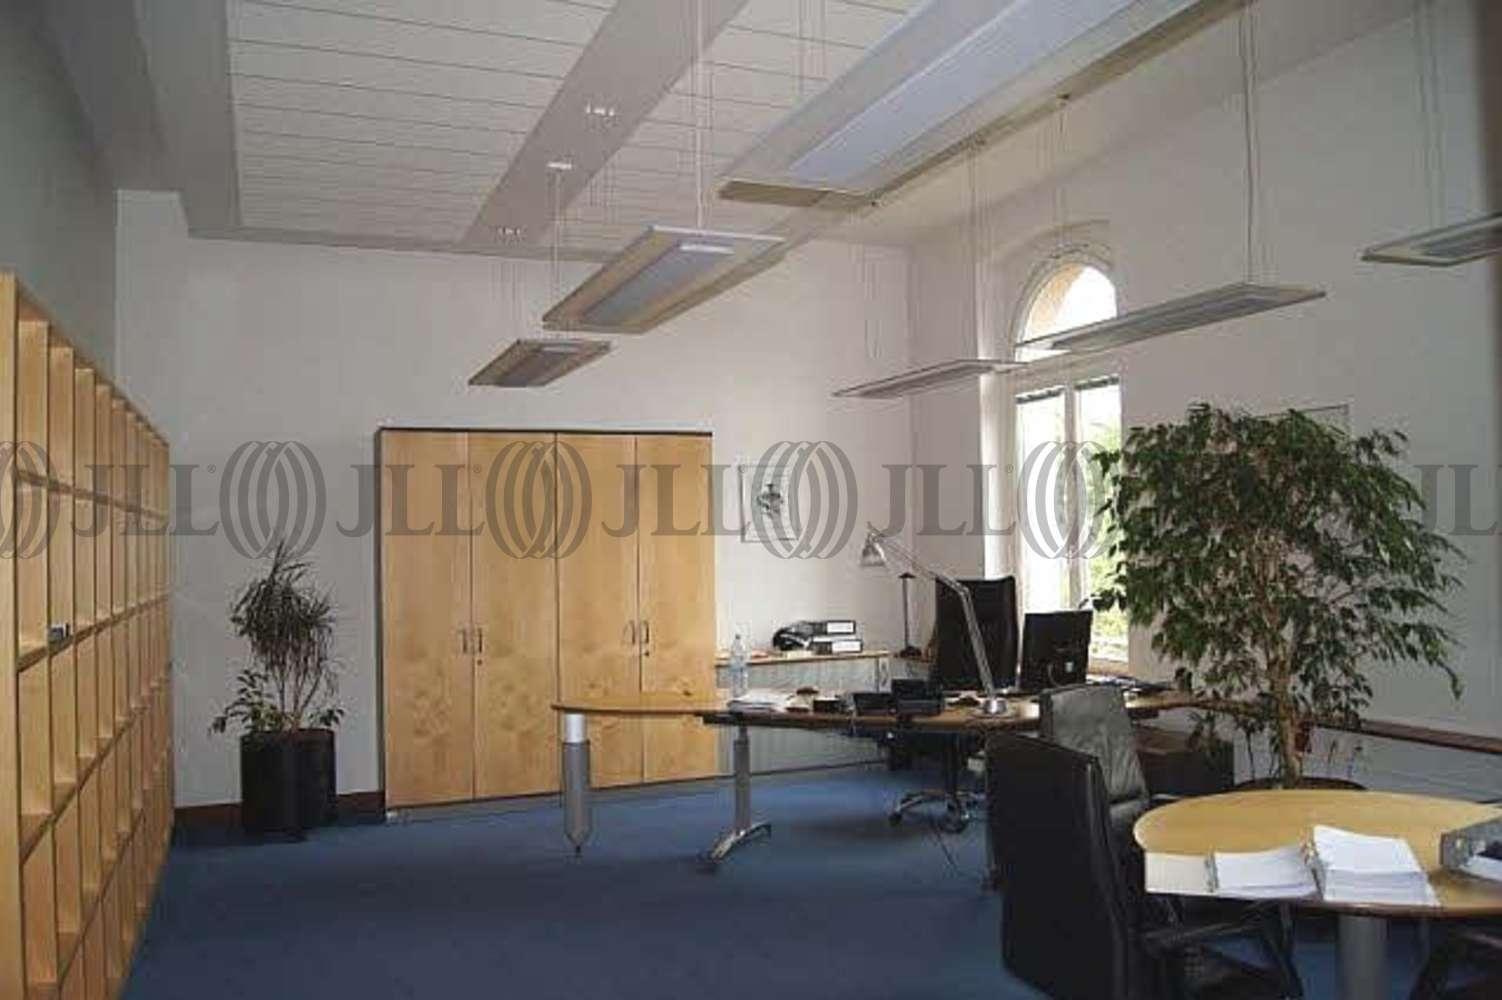 Büros Frankfurt am main, 60594 - Büro - Frankfurt am Main, Sachsenhausen - F1356 - 10046872